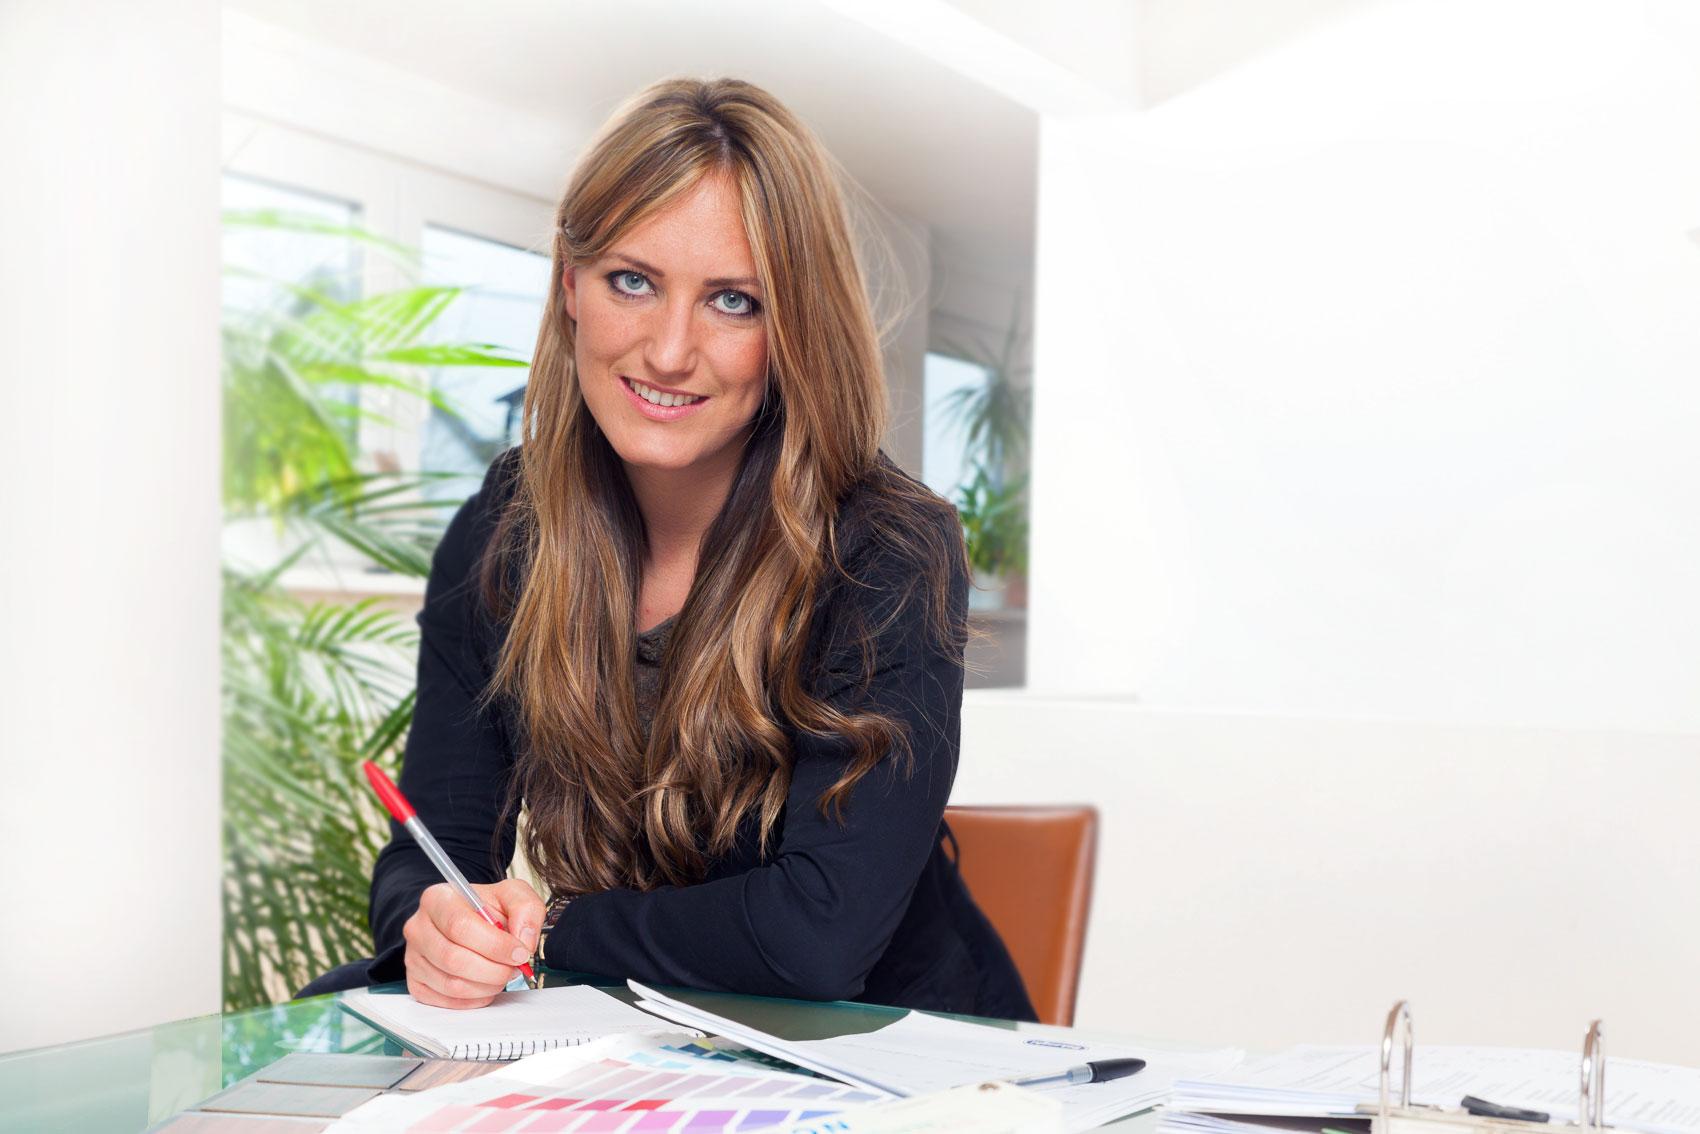 Jessica Niggemann